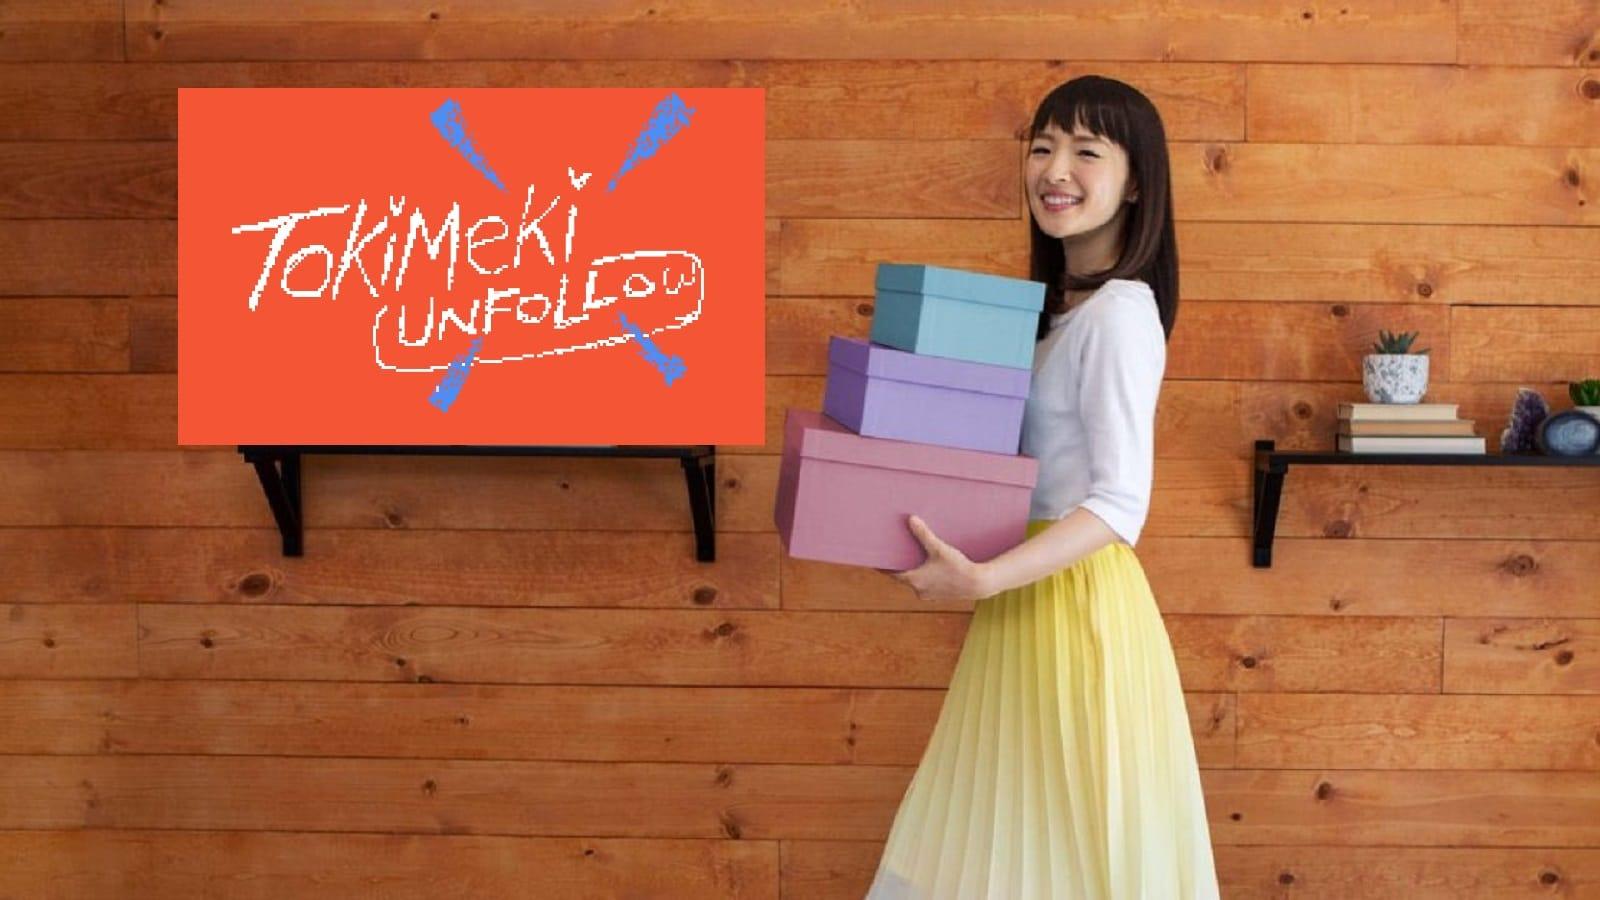 twitter unfollow tool featuring marie kondo